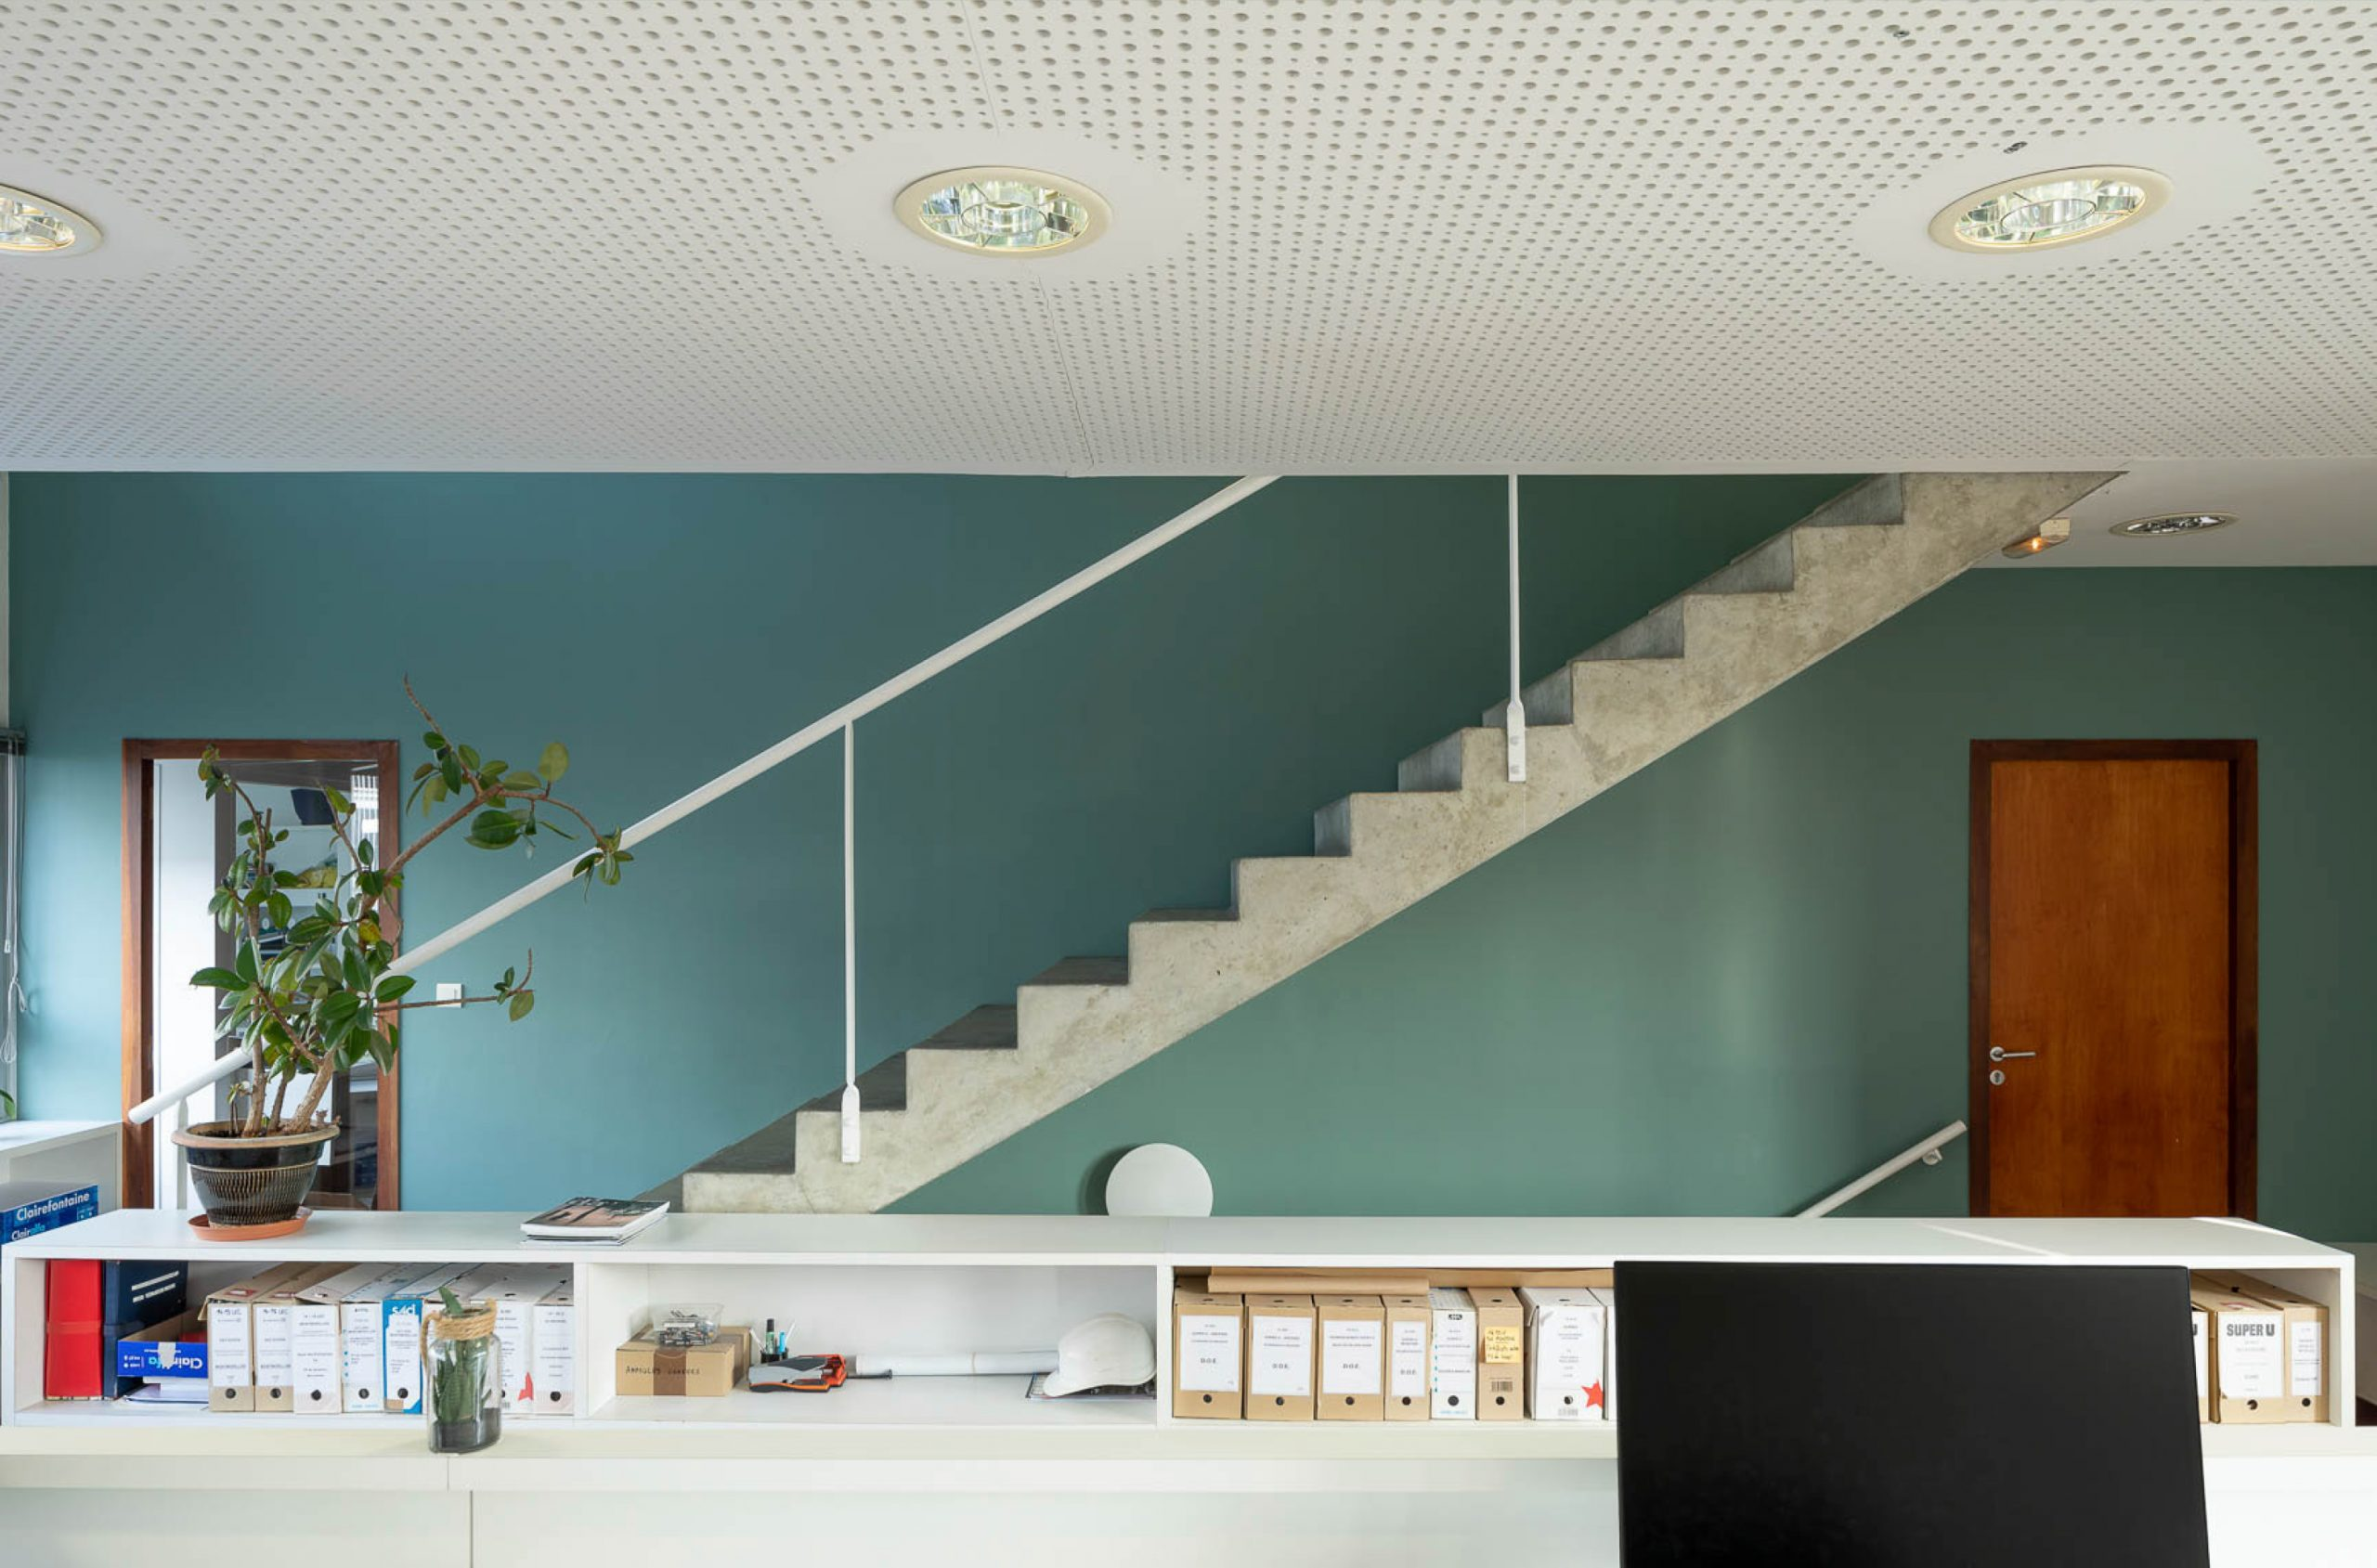 Bureau moderne avec escalier